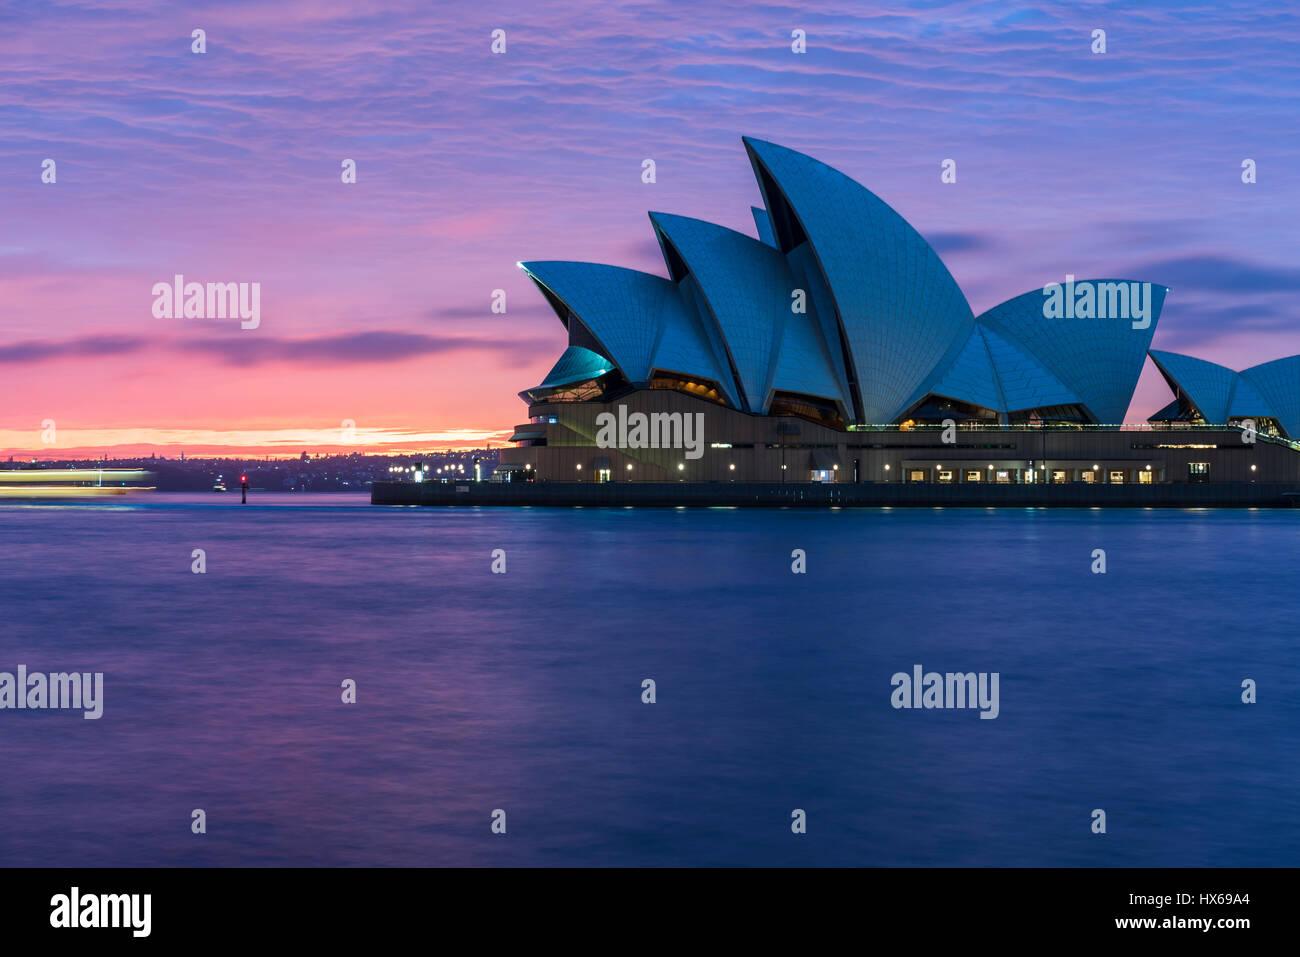 Sydney Opera House at dawn - Stock Image